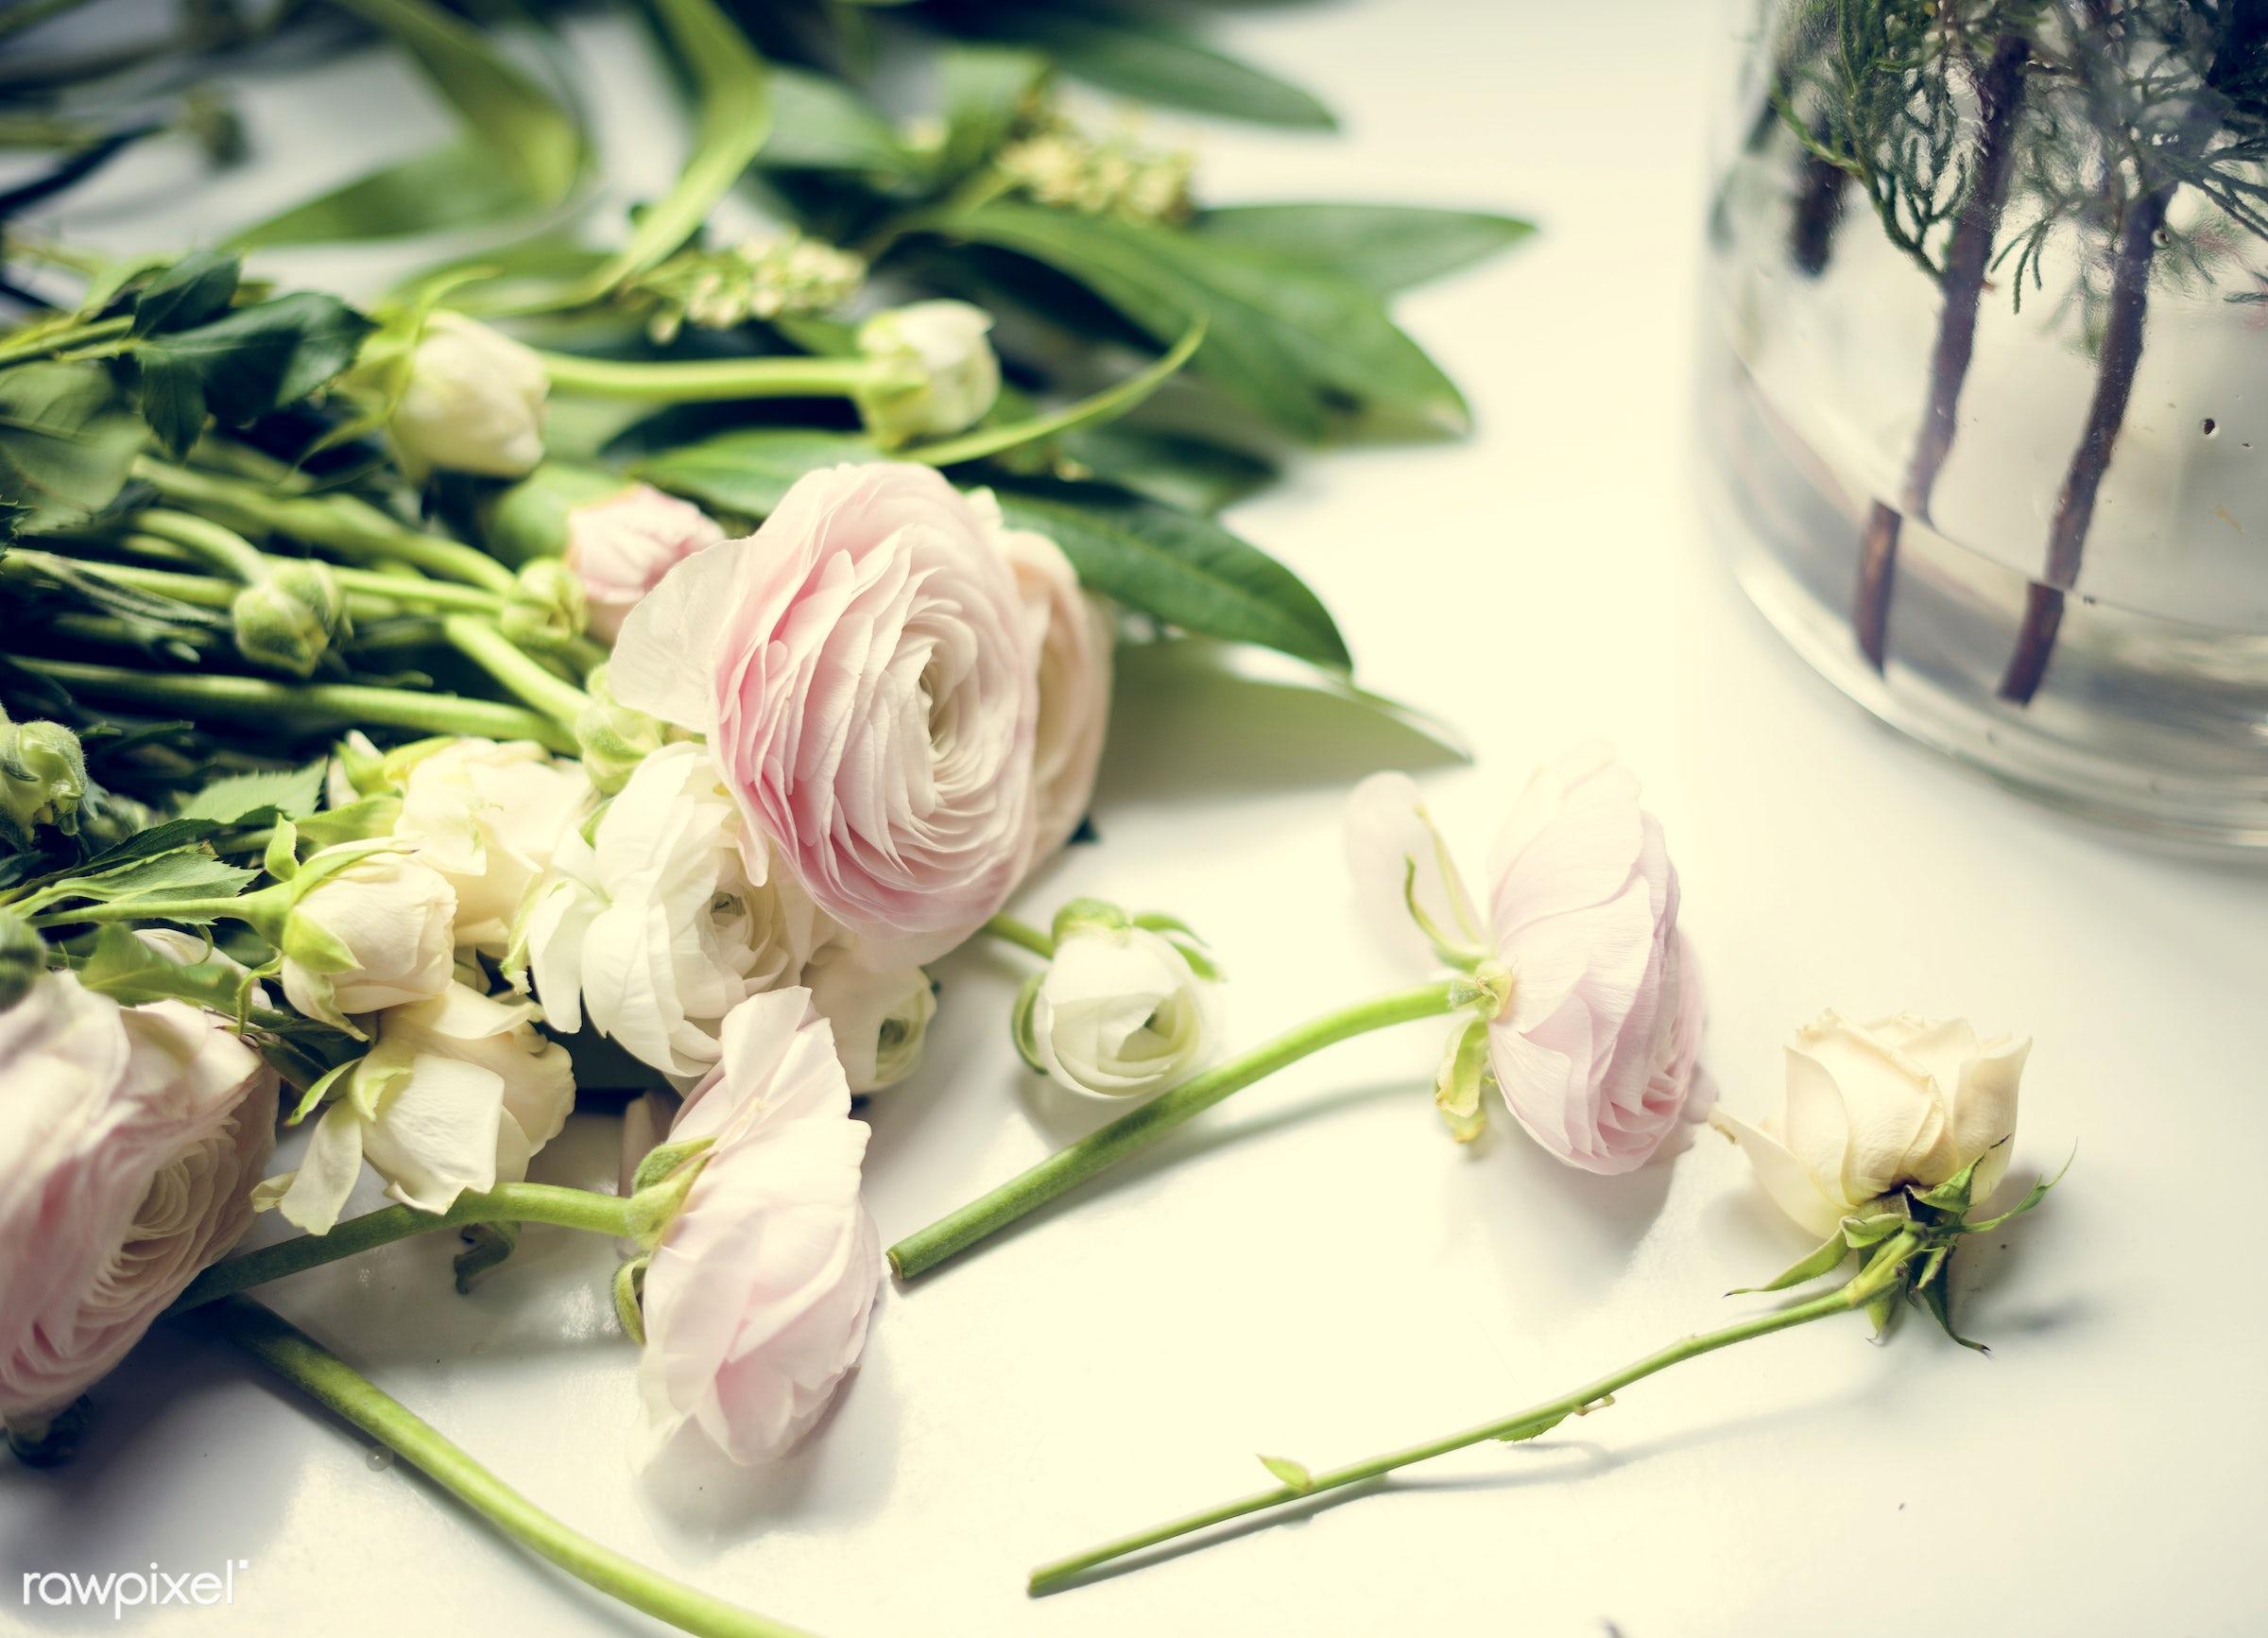 festive, nobody, shop, detail, ranunculus, decorative, colorful, plants, spring, blossom, decor, nature, fresh, attractive,...